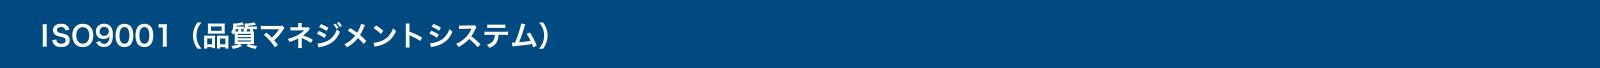 ISO9001(品質マネジメントシステム)